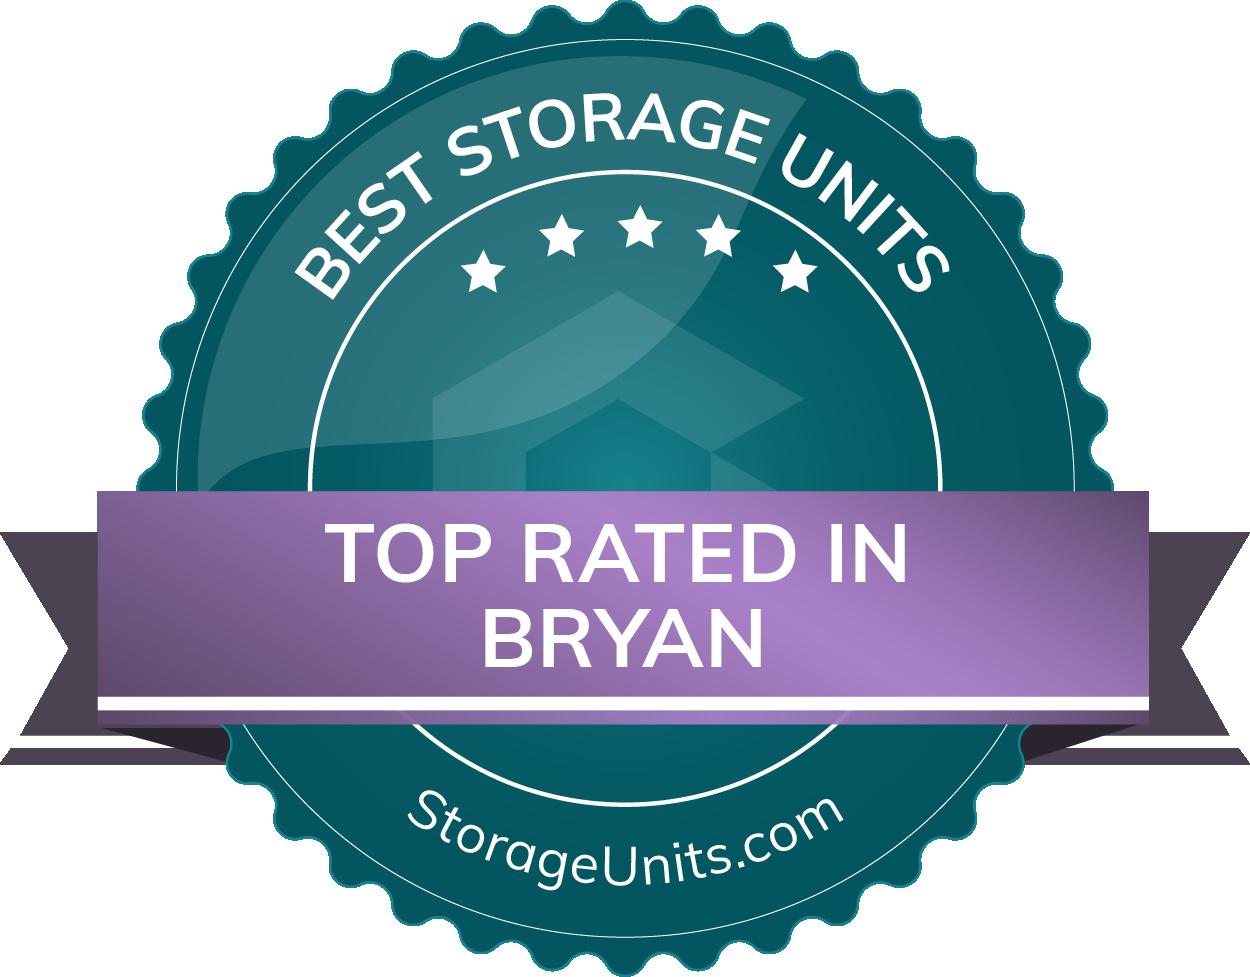 Storage Units in Bryan